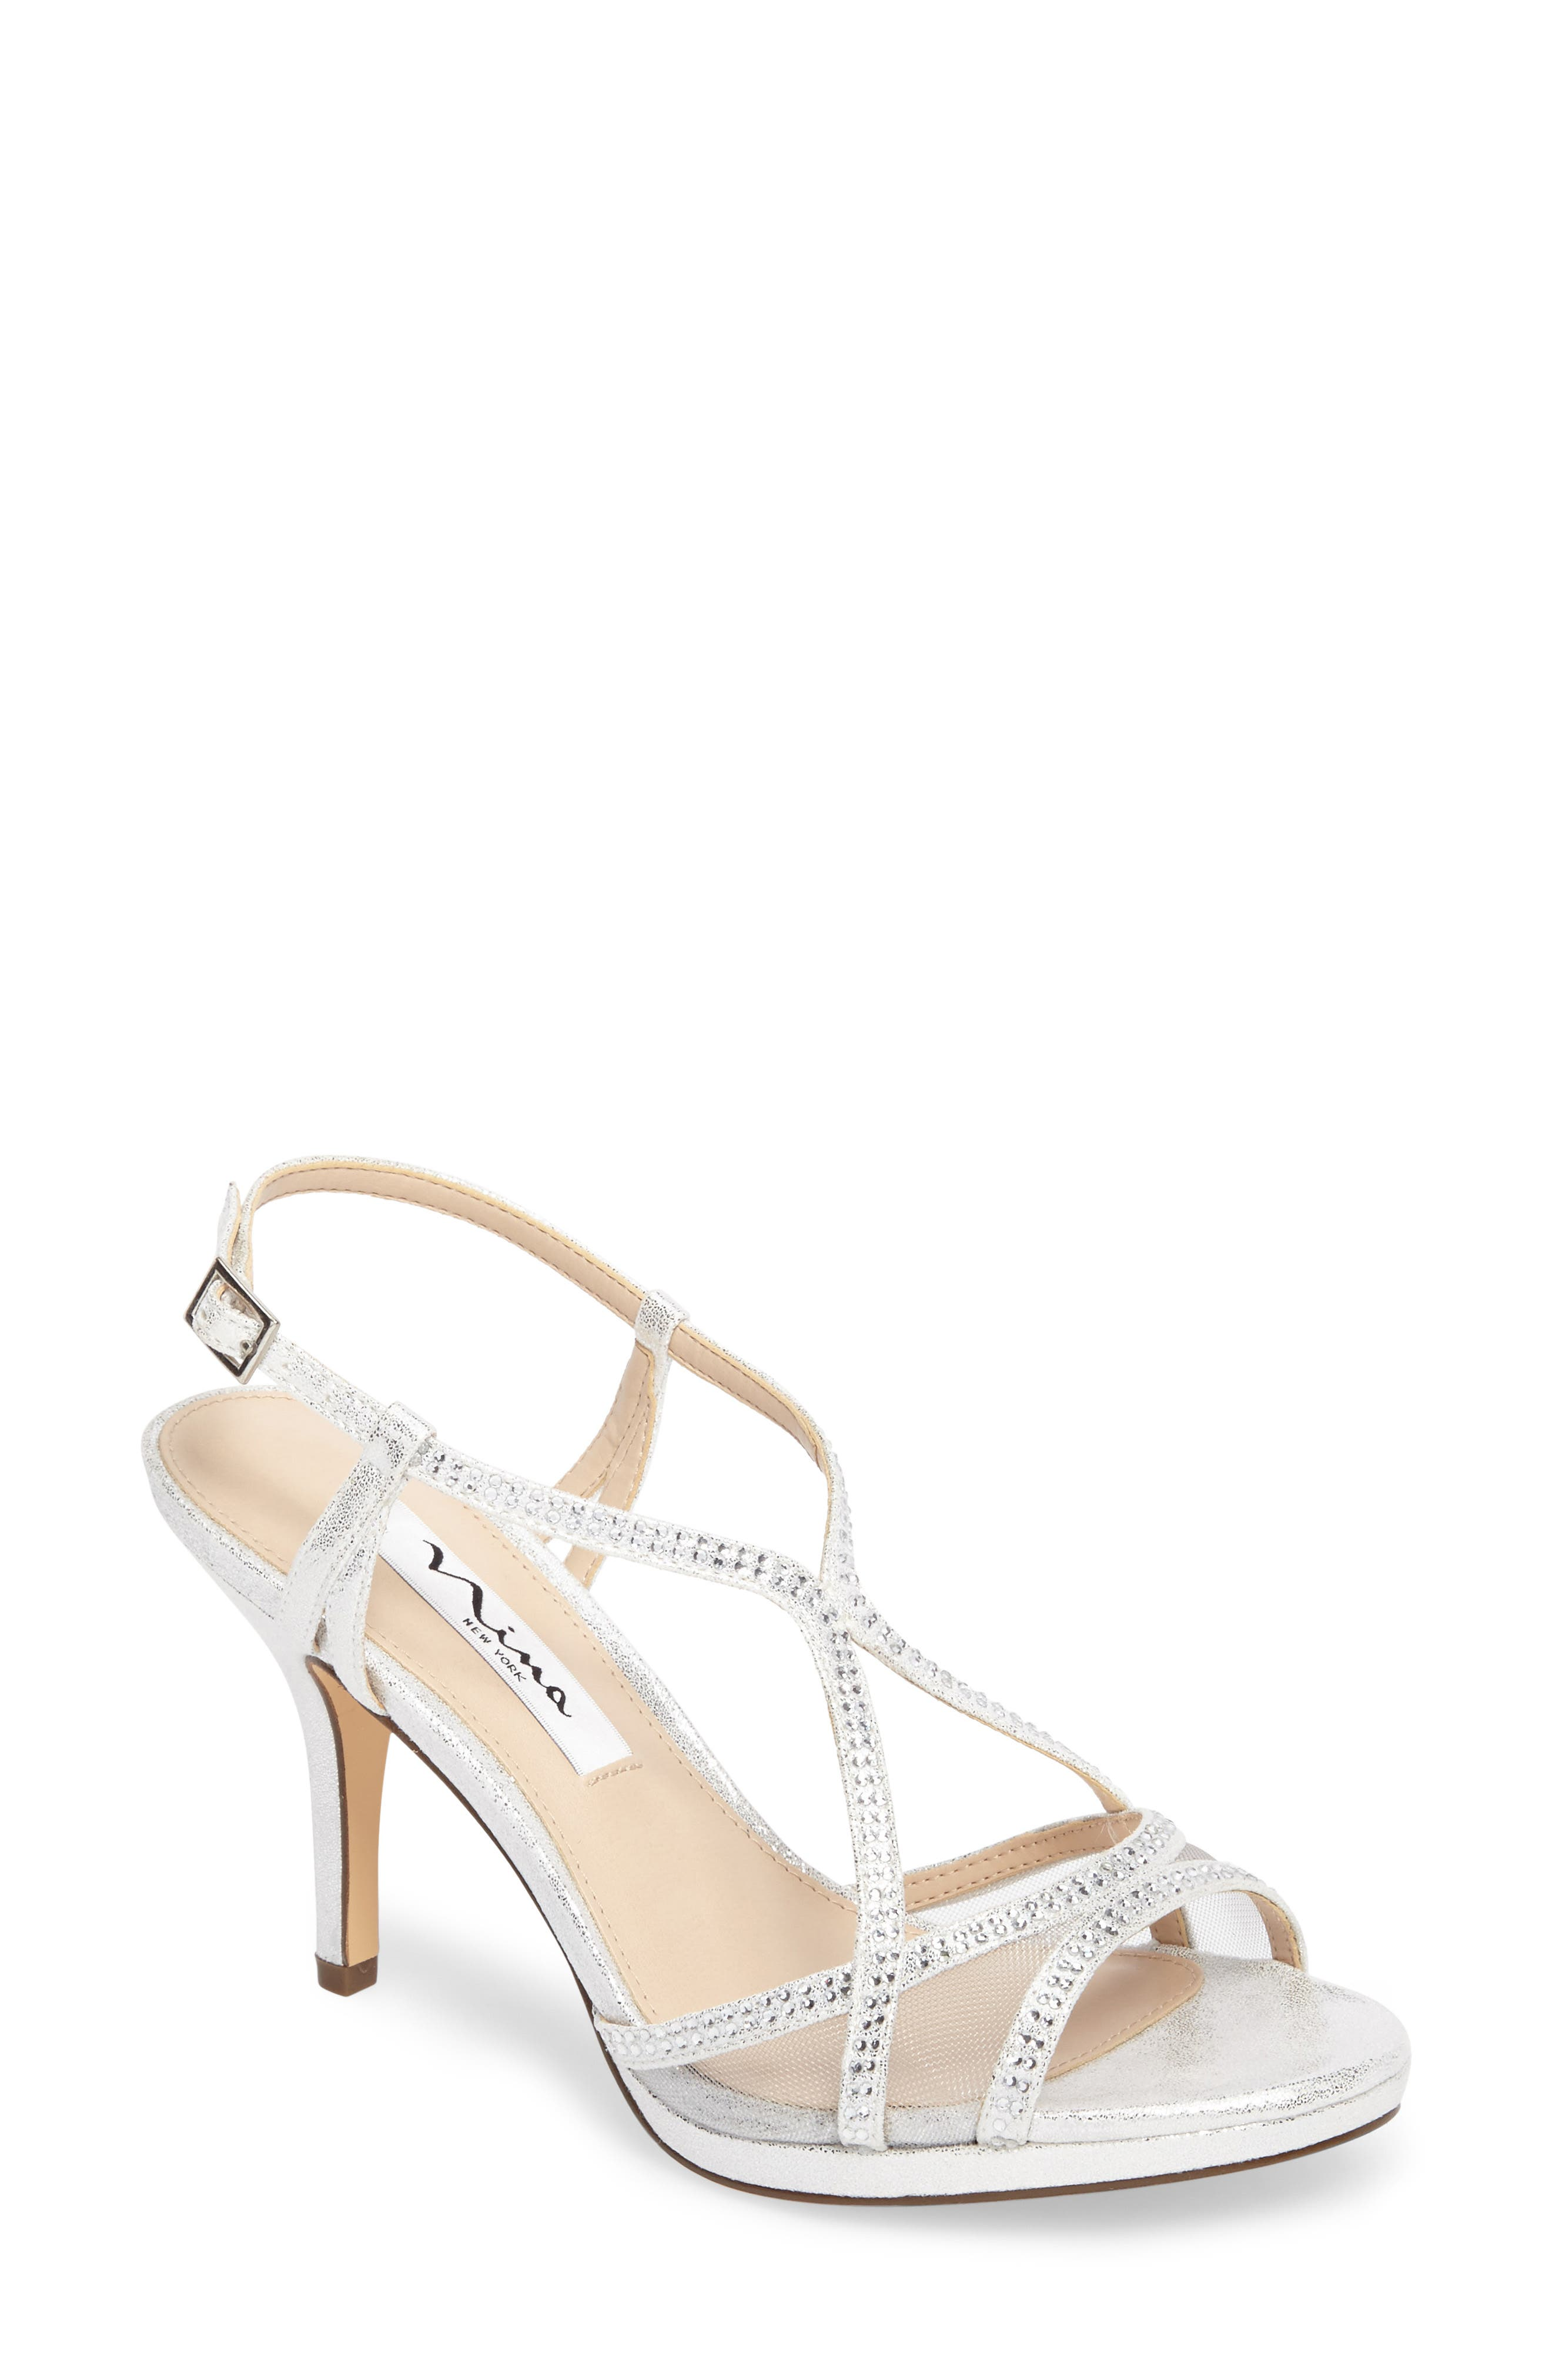 NINA Blossom Crystal Embellished Sandal, Main, color, SILVER FABRIC